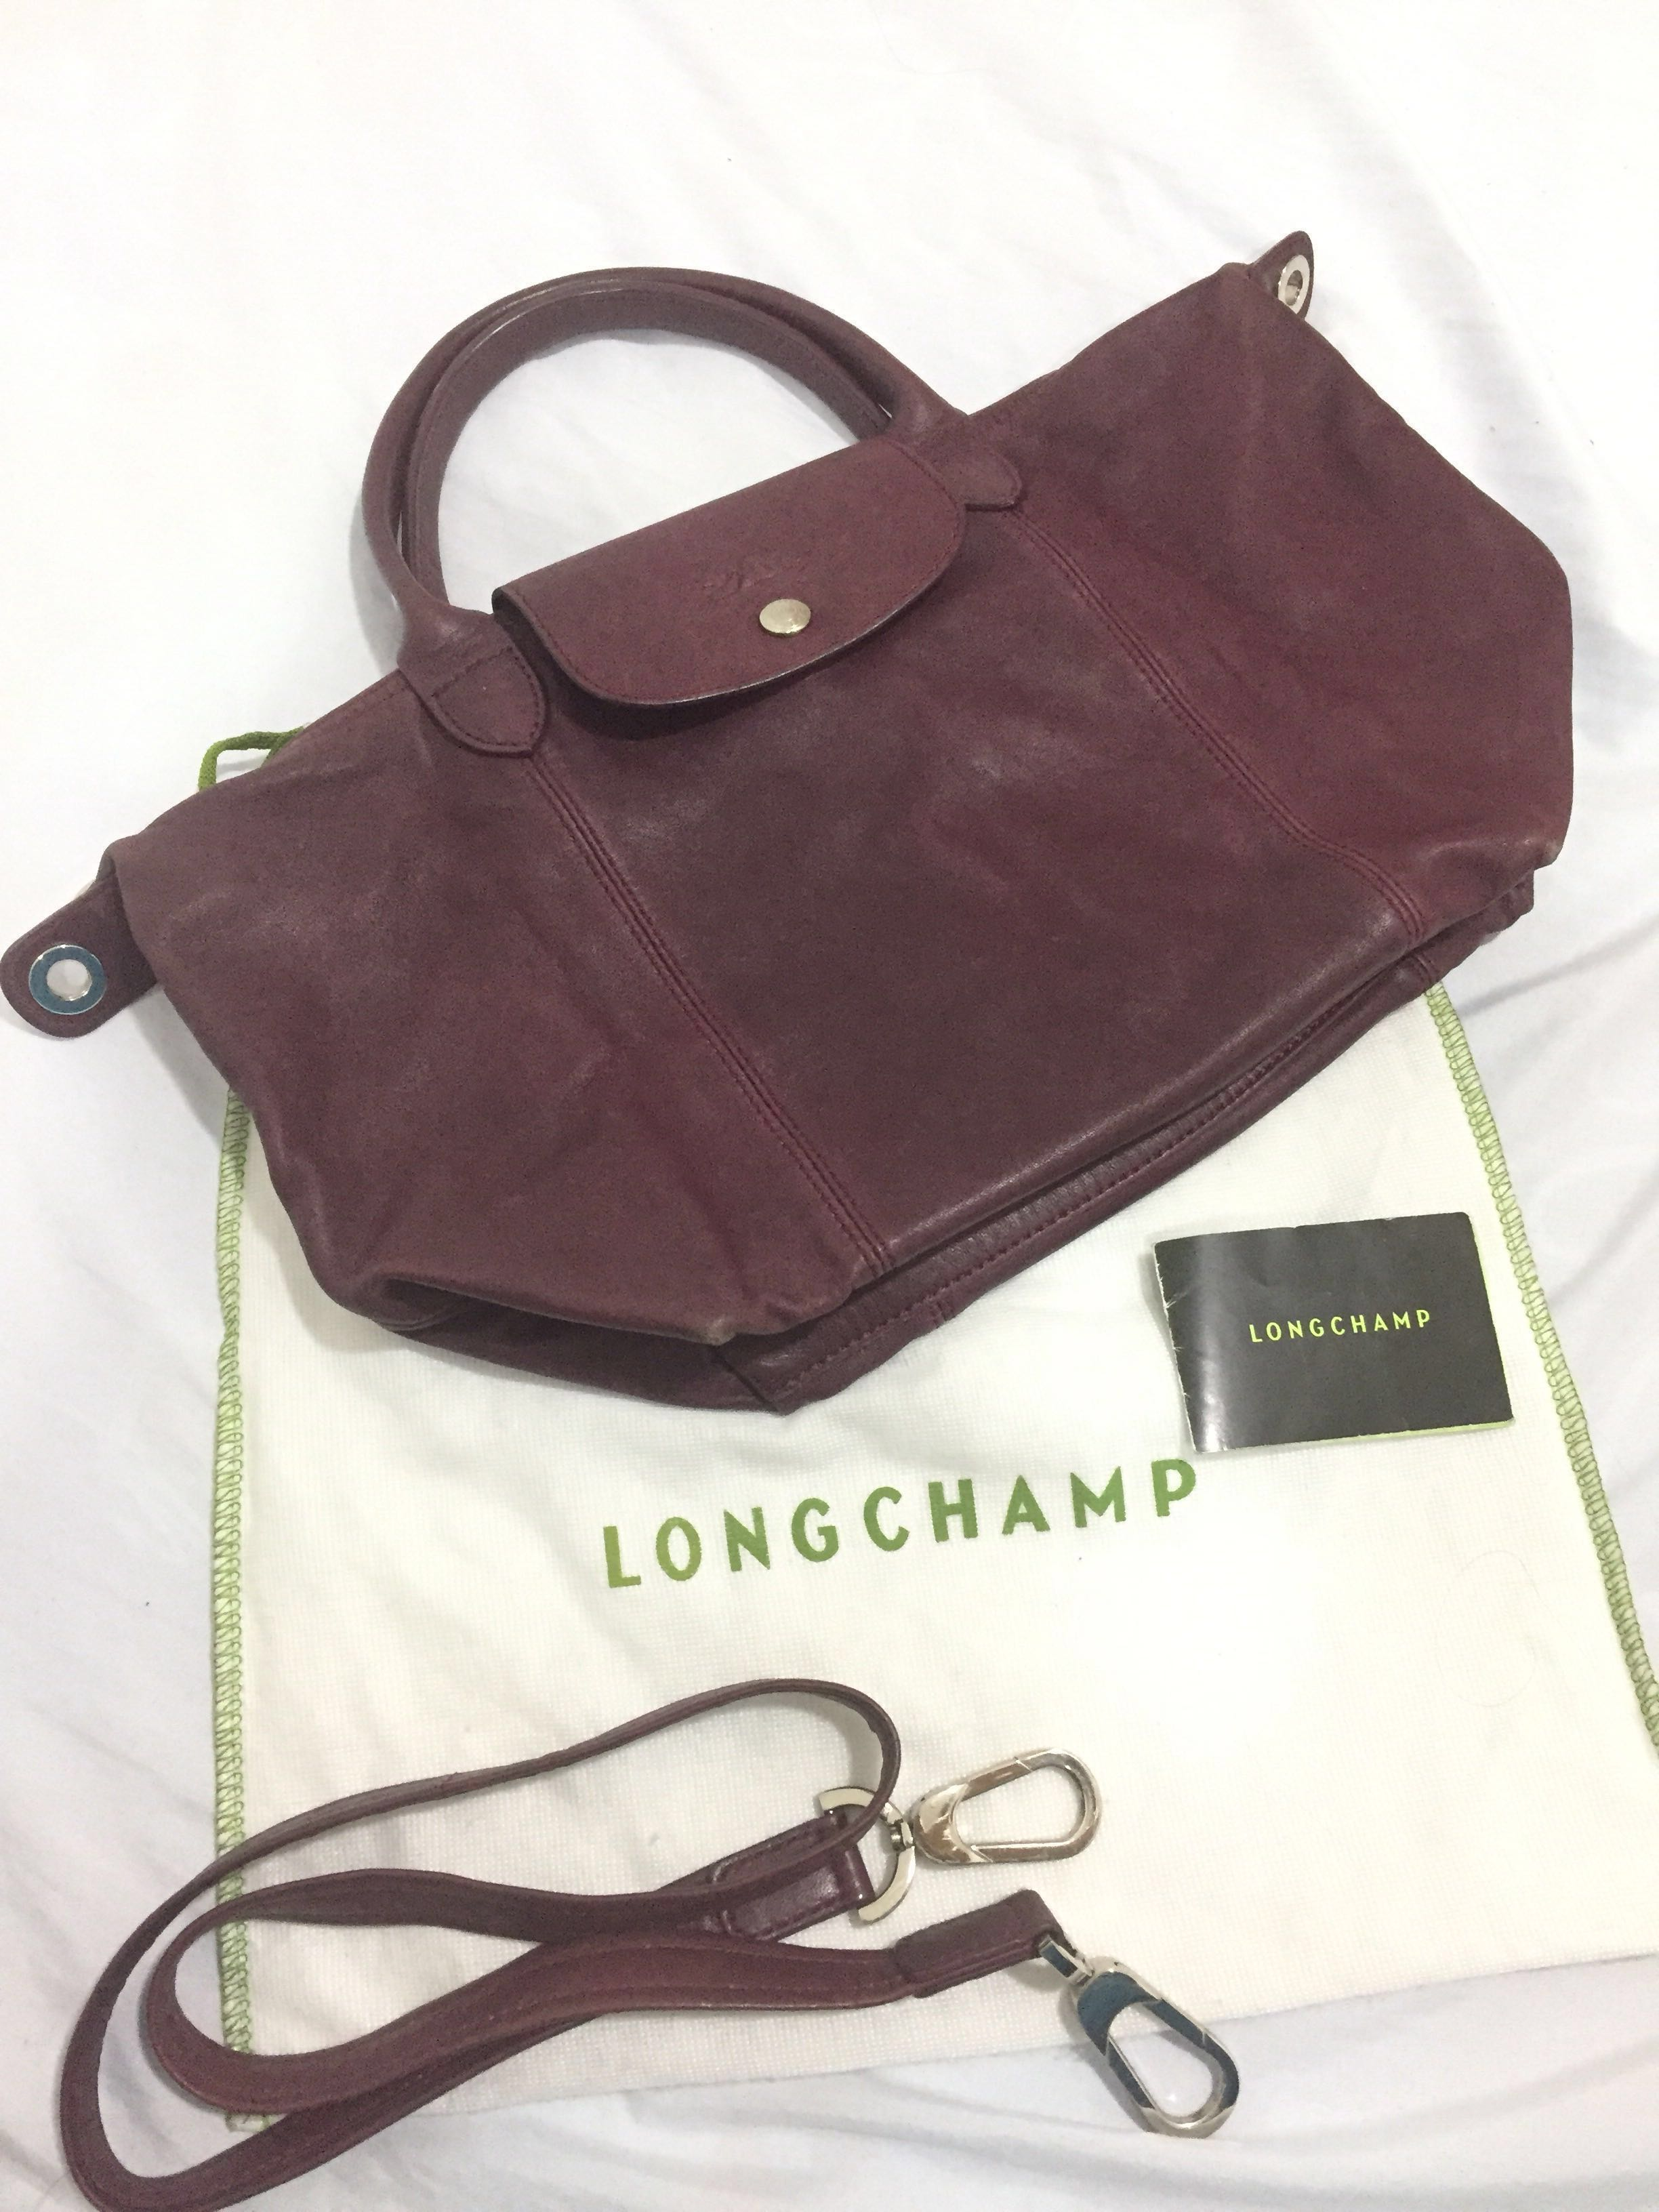 20c658c86d Longchamp Le Pliage Cuir Small Top Handle in Burgundy, Women's ...